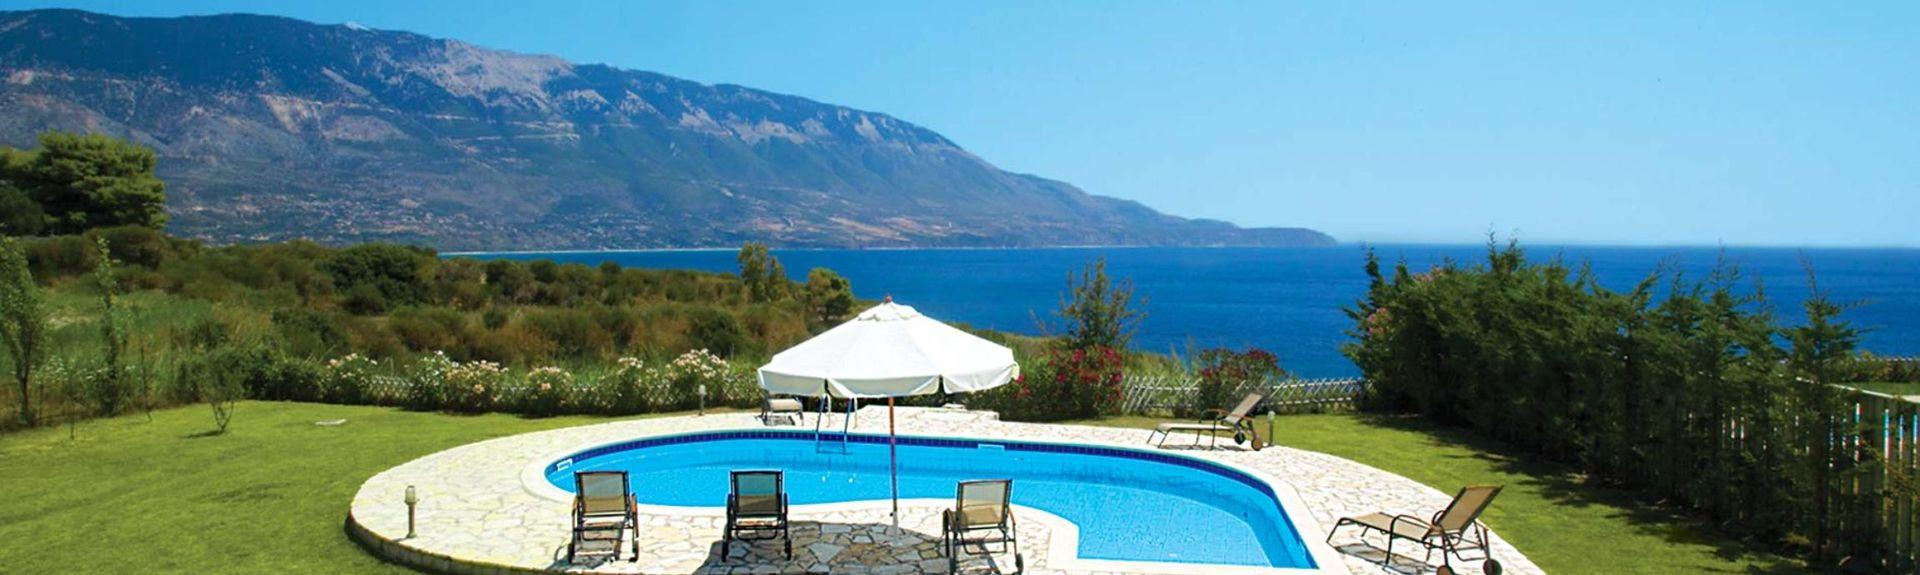 Spartia, Kefalonia, Ionian Islands Region, Greece